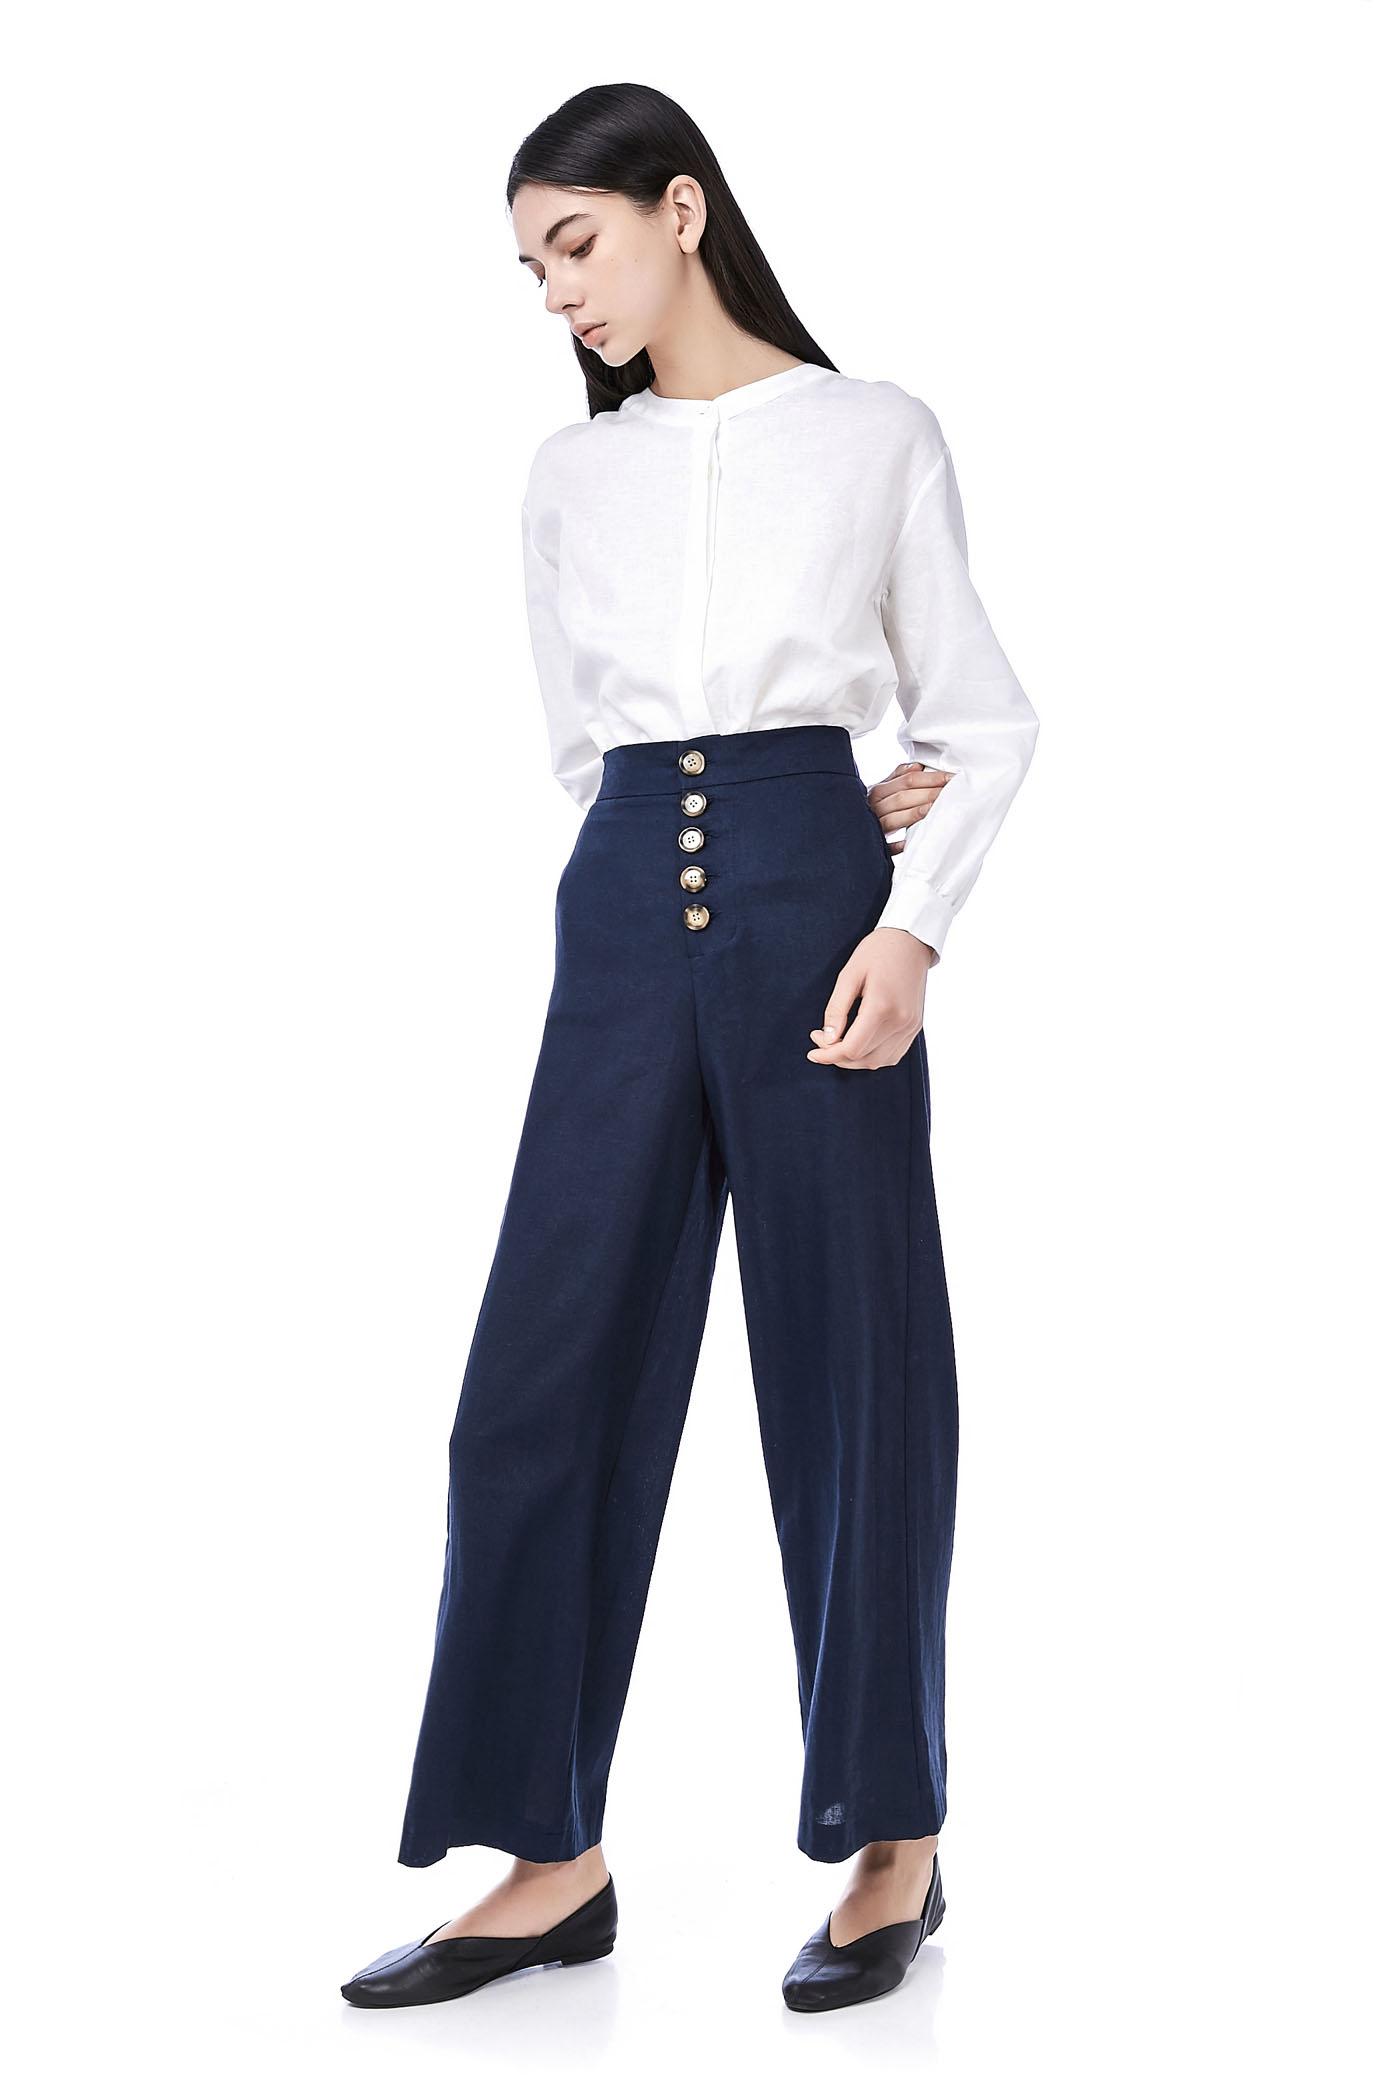 Vonda High-Waisted Pants